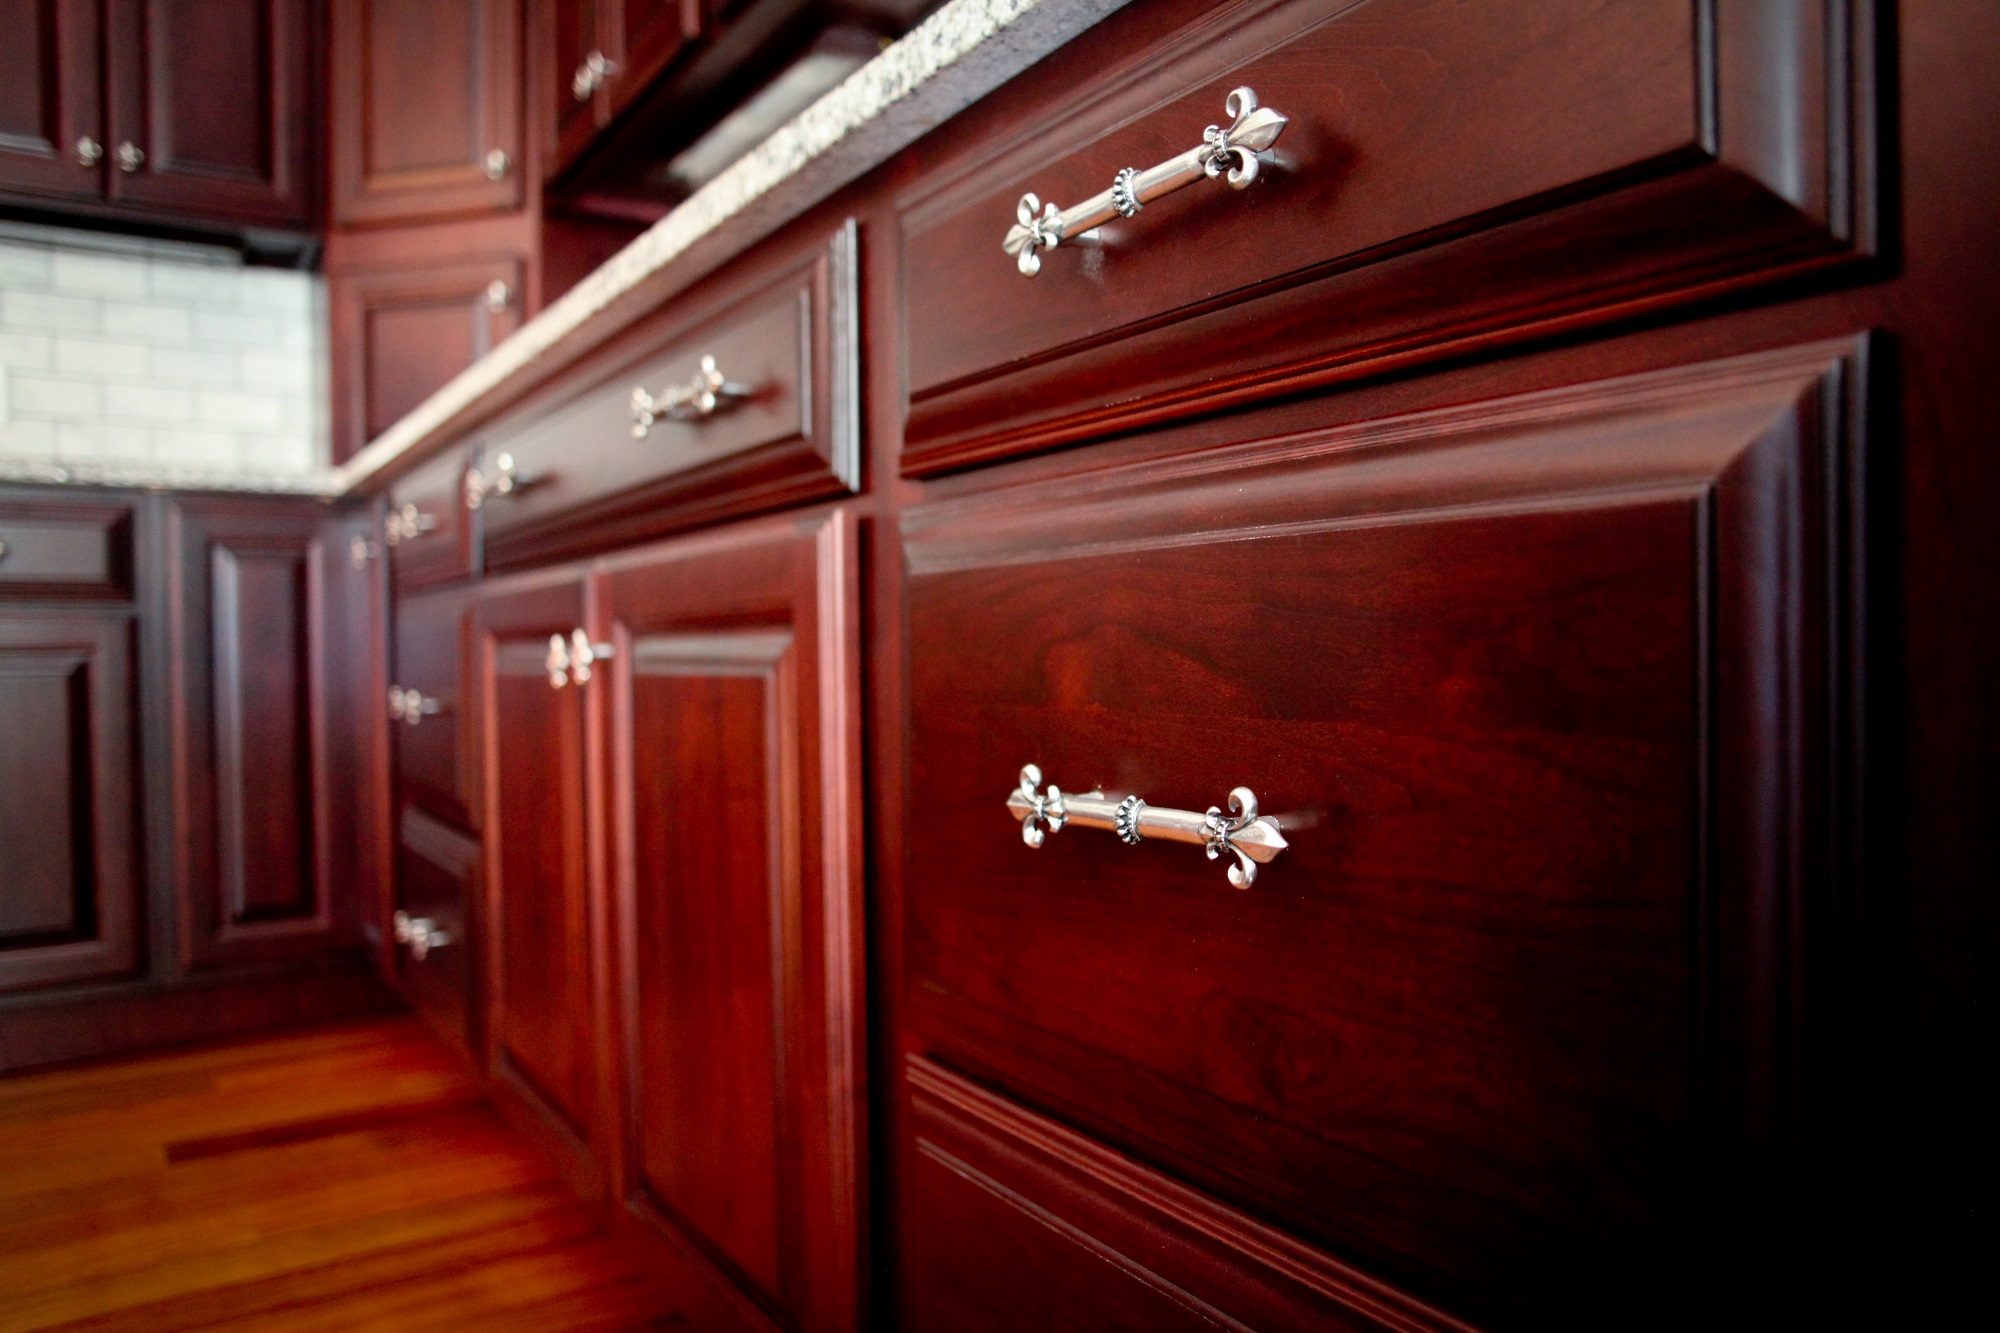 kitchen cabinet painting repaint kitchen cabinets Repainting Kitchen Cabinets Common Questions